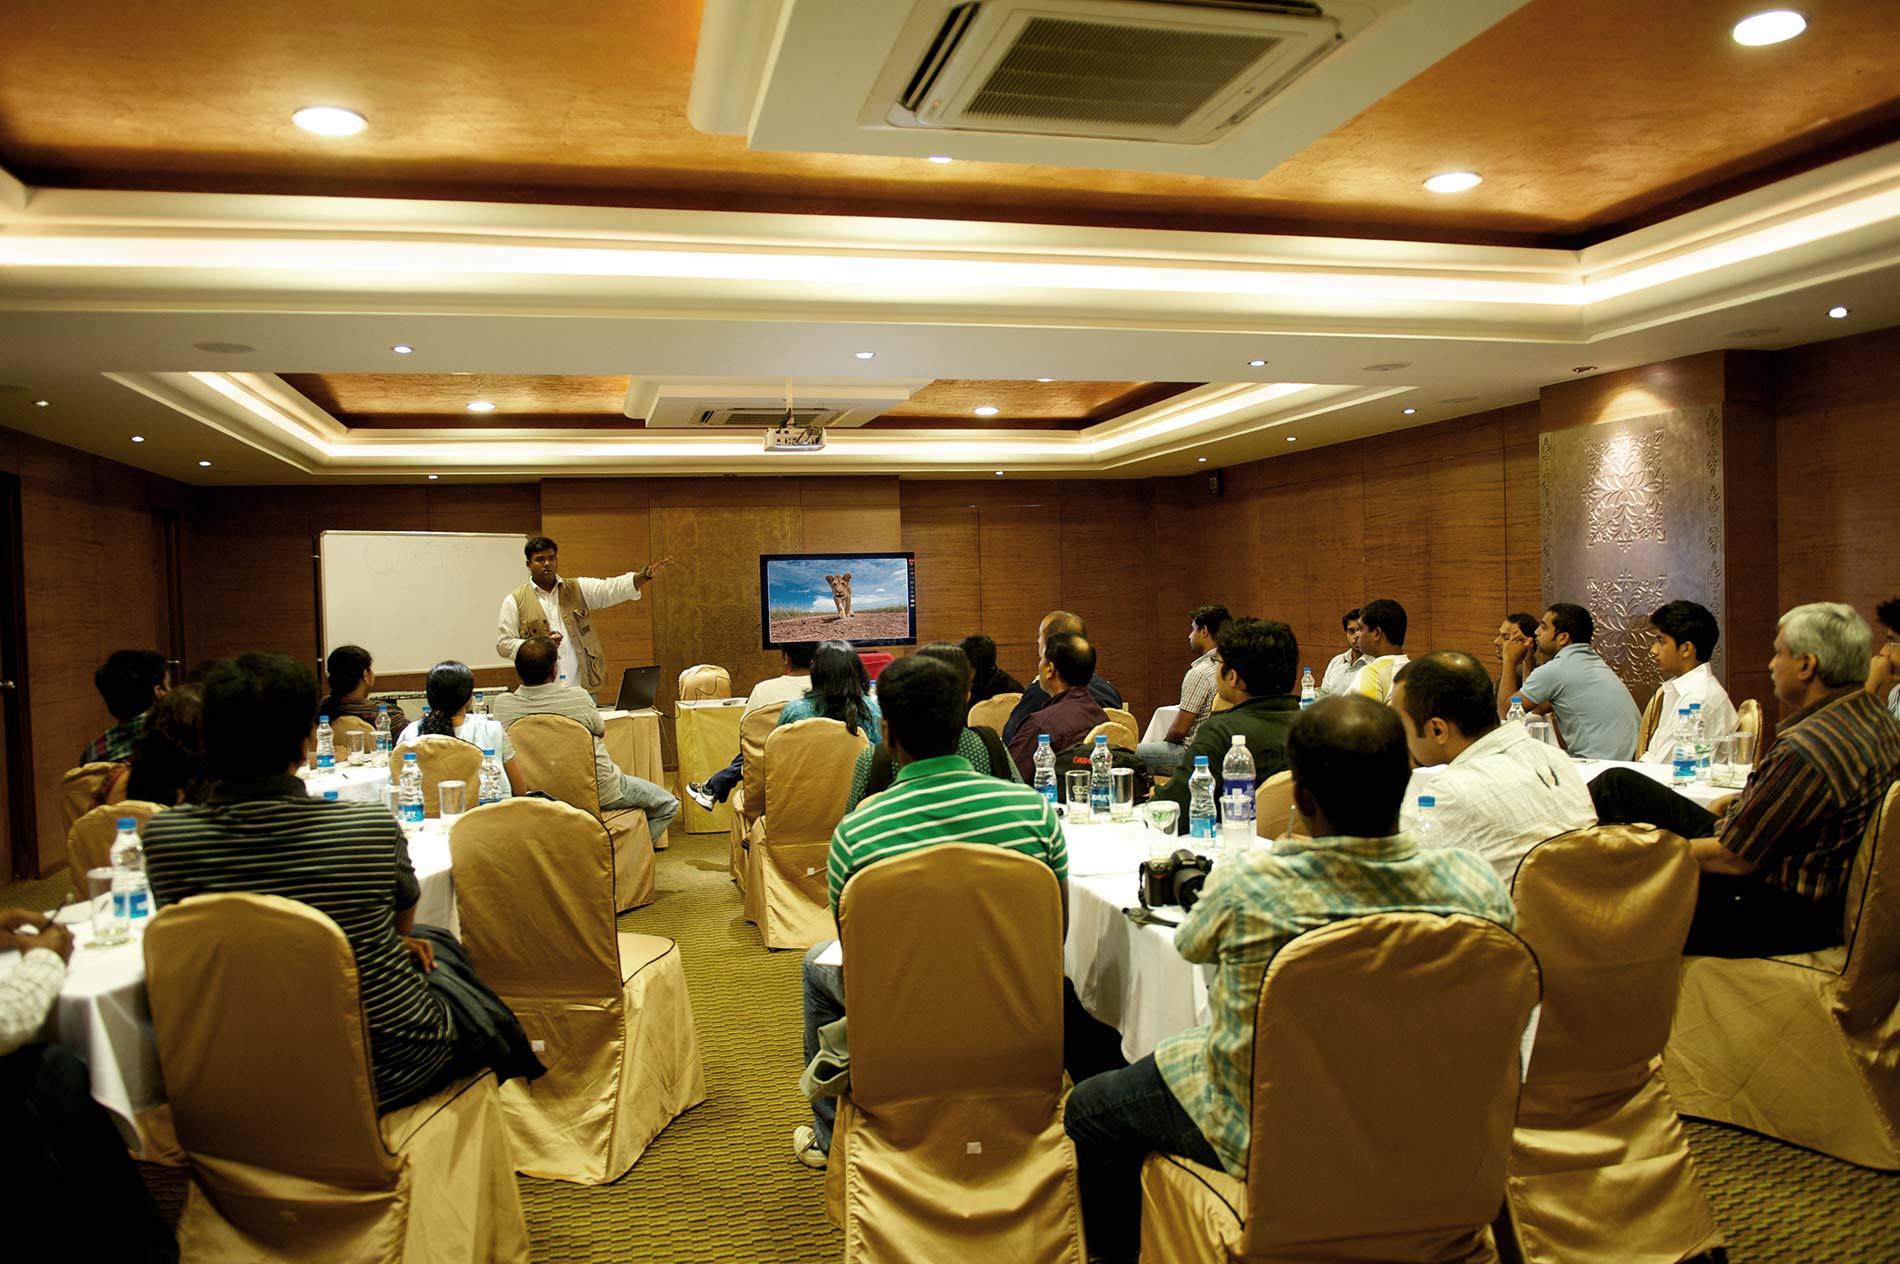 Toehold Photography Workshop in Mumbai